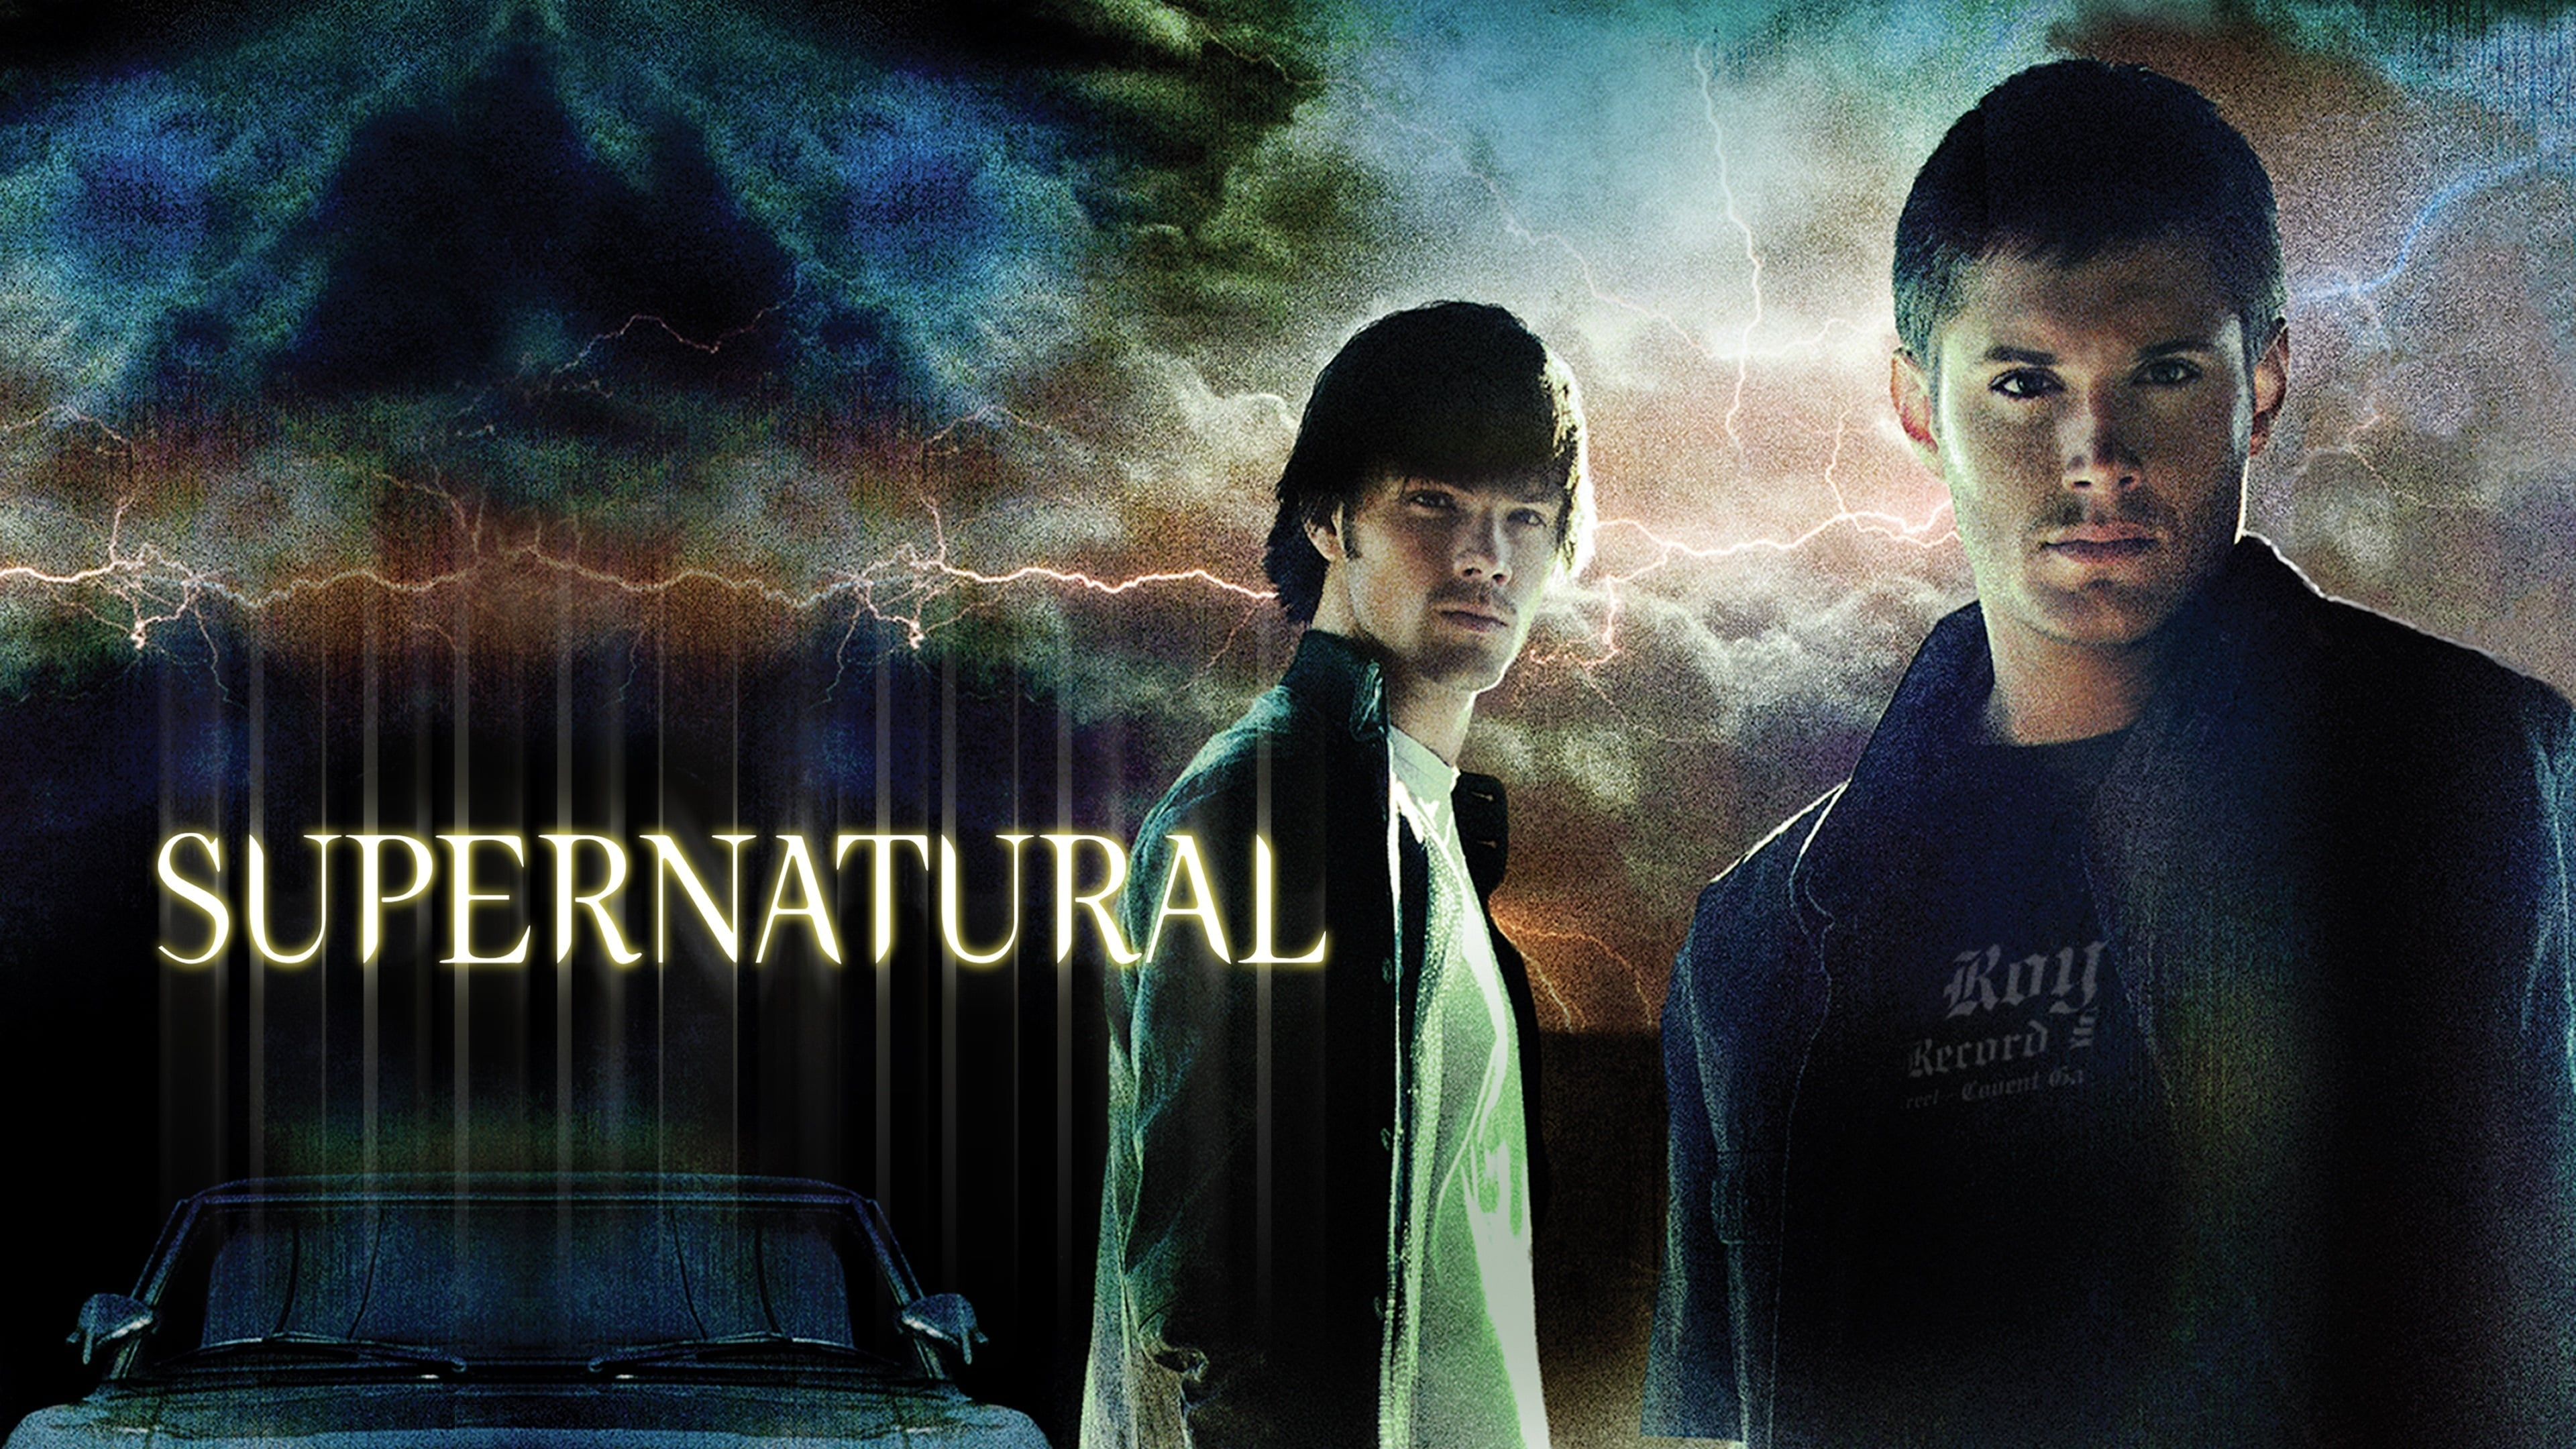 Supernatural - Season 14 Episode 10 Nihilism